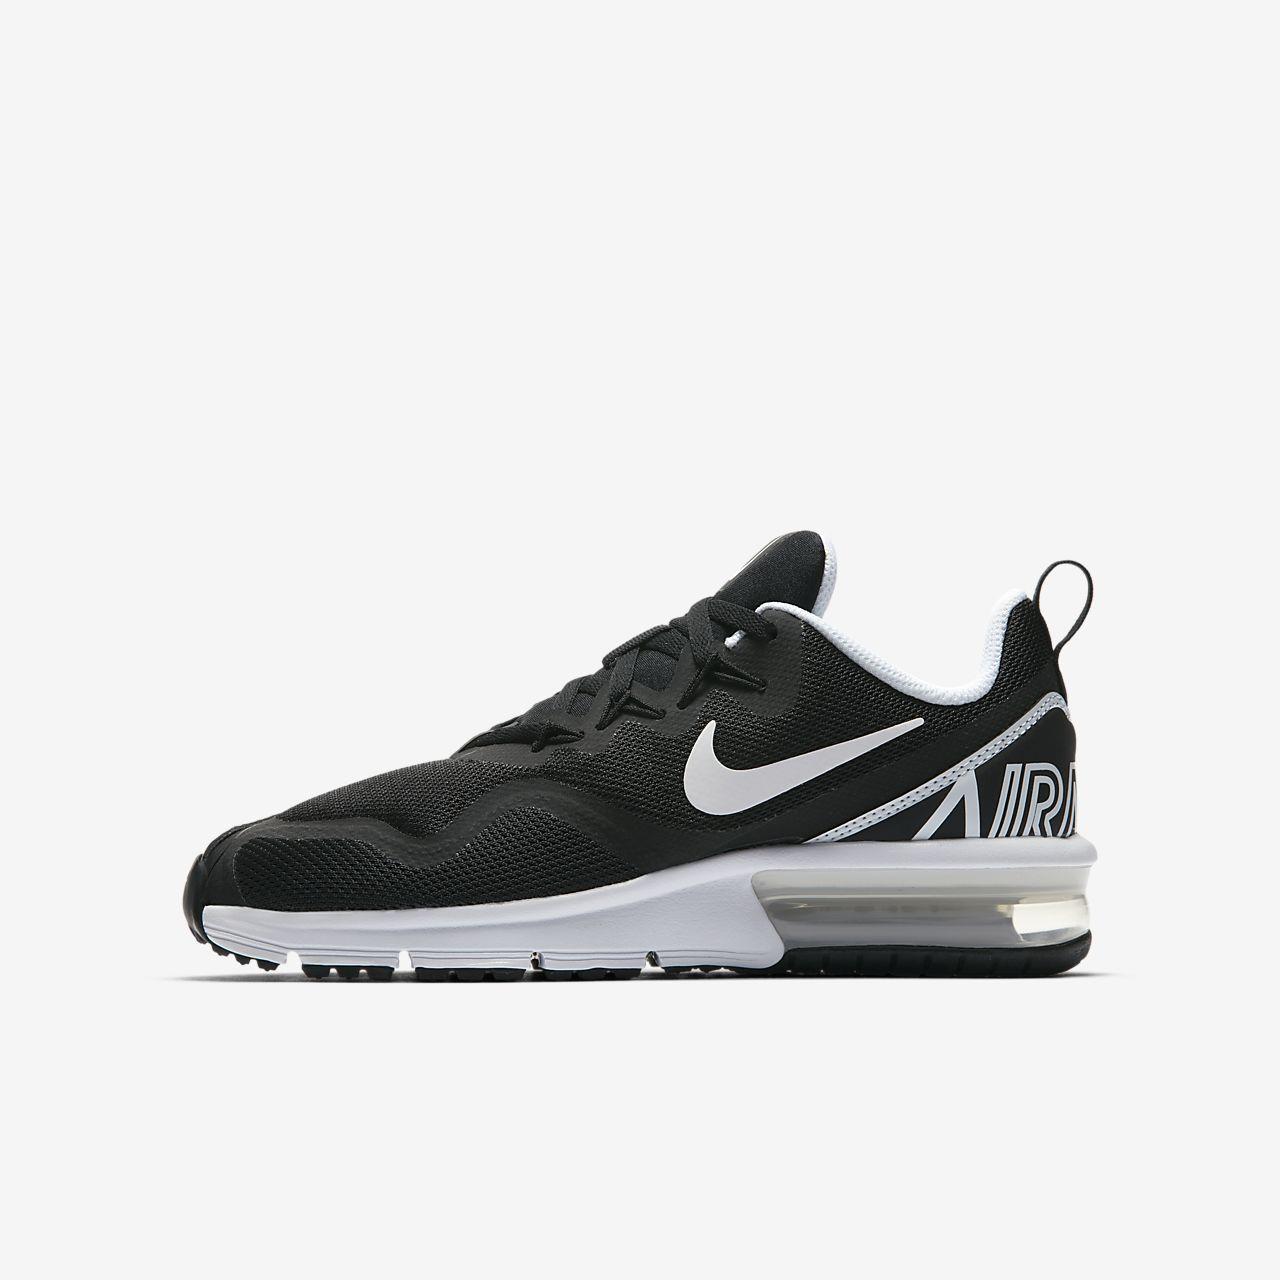 Nike Air Max Fury Genç Çocuk Koşu Ayakkabısı